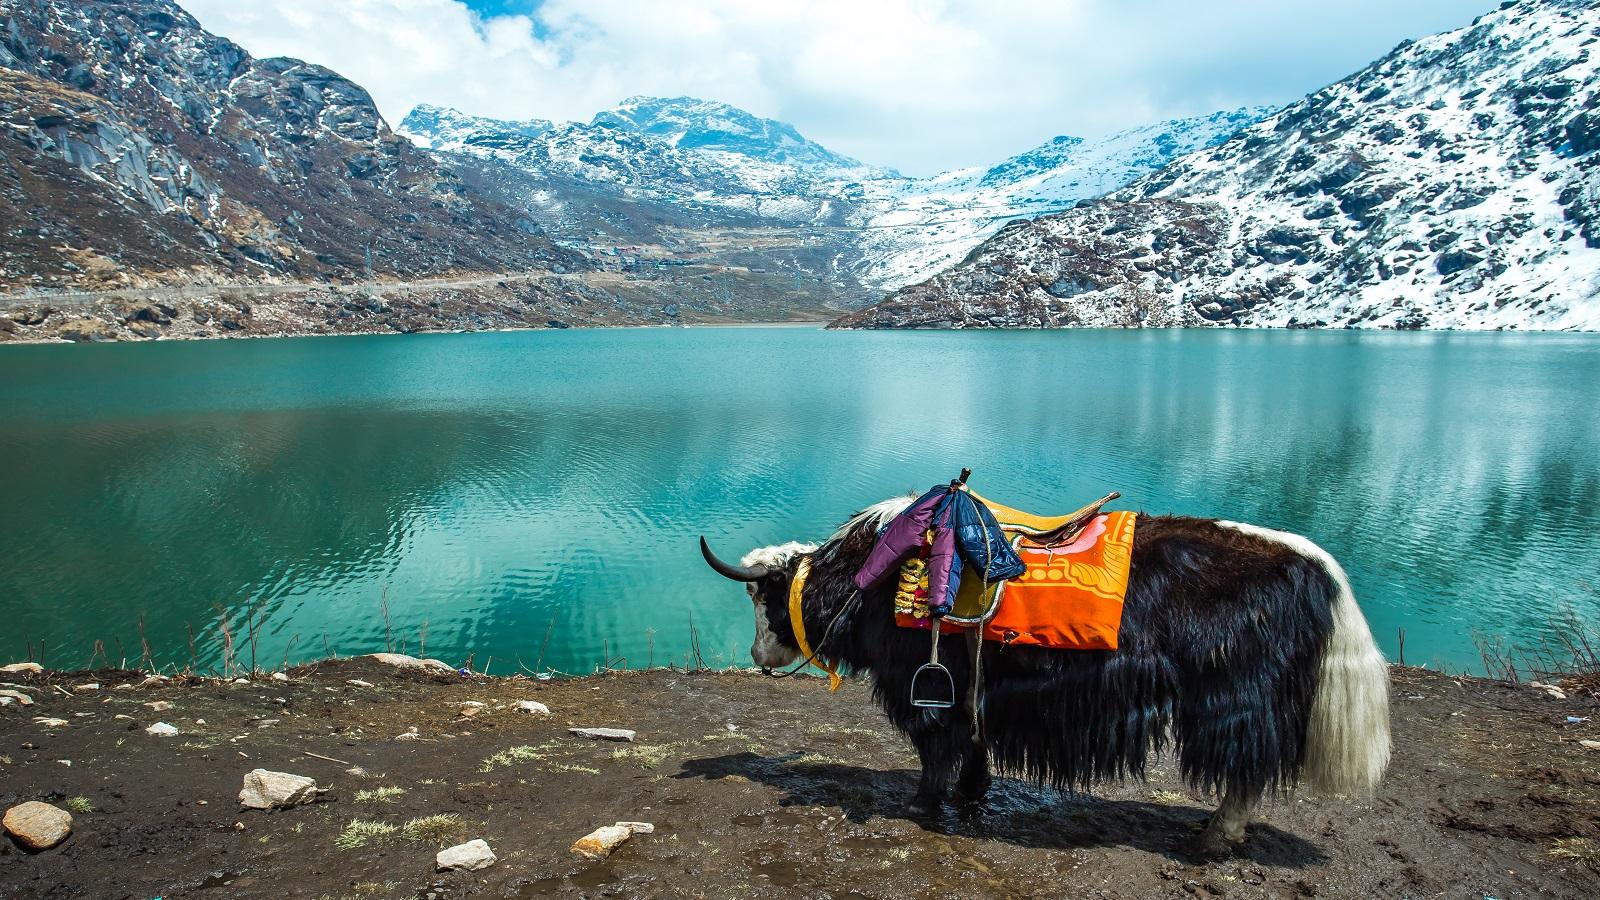 Ladakh Heights